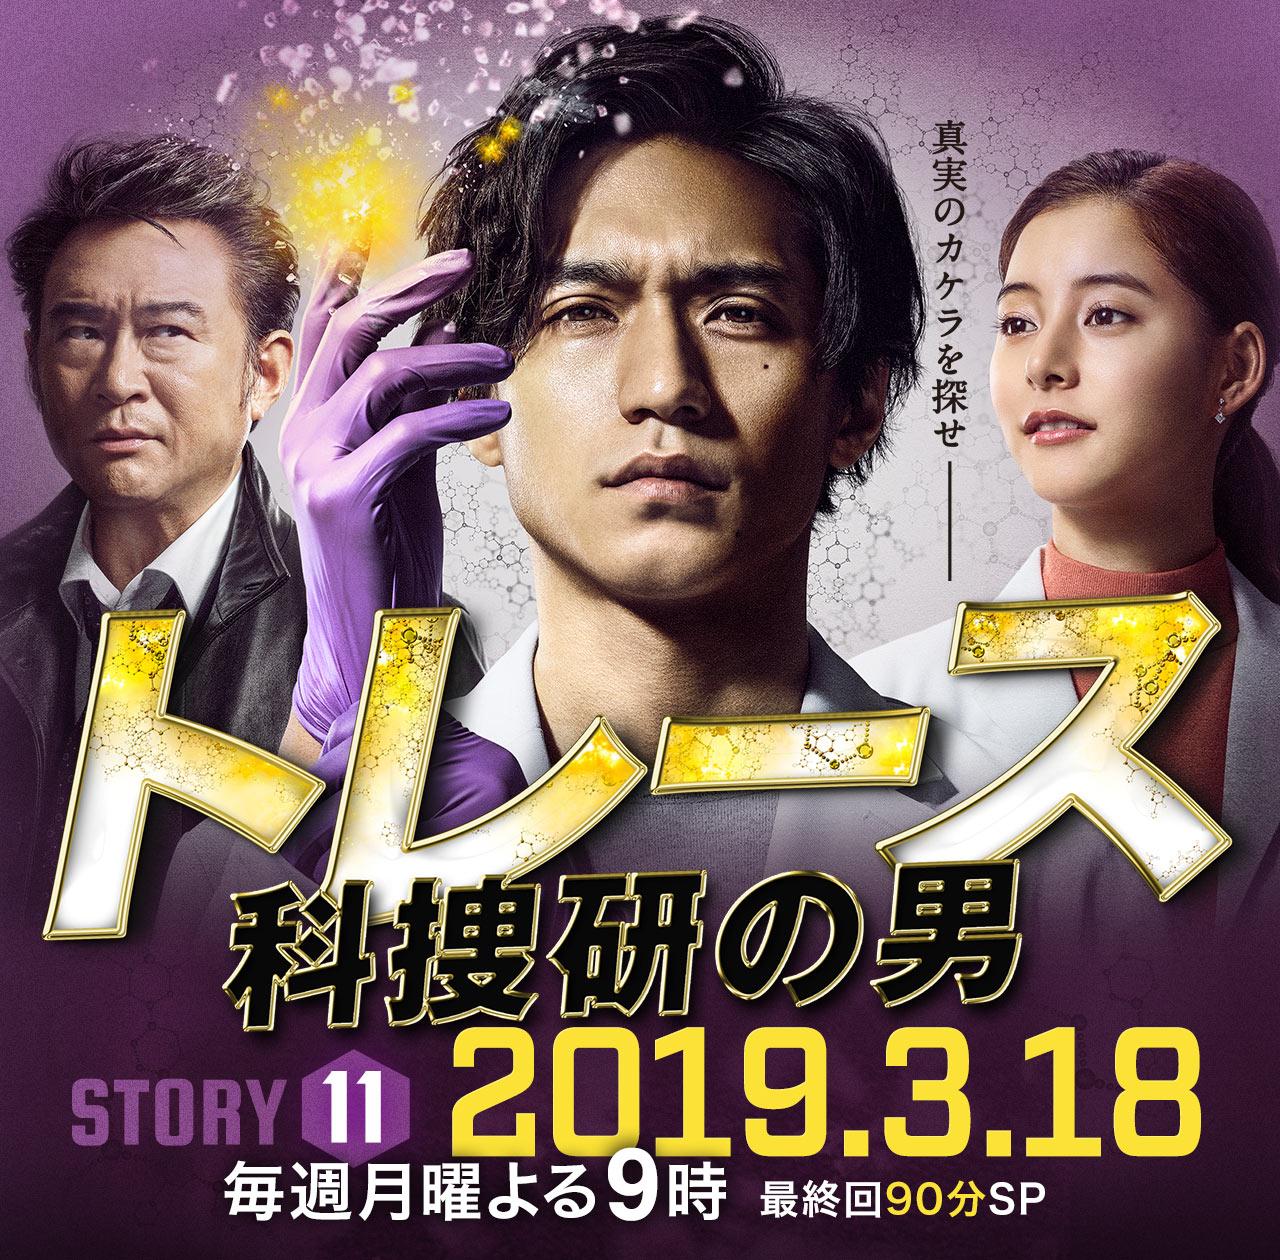 Omega Episode 2 Subtitle Indonesia: トレース~科捜研の男~